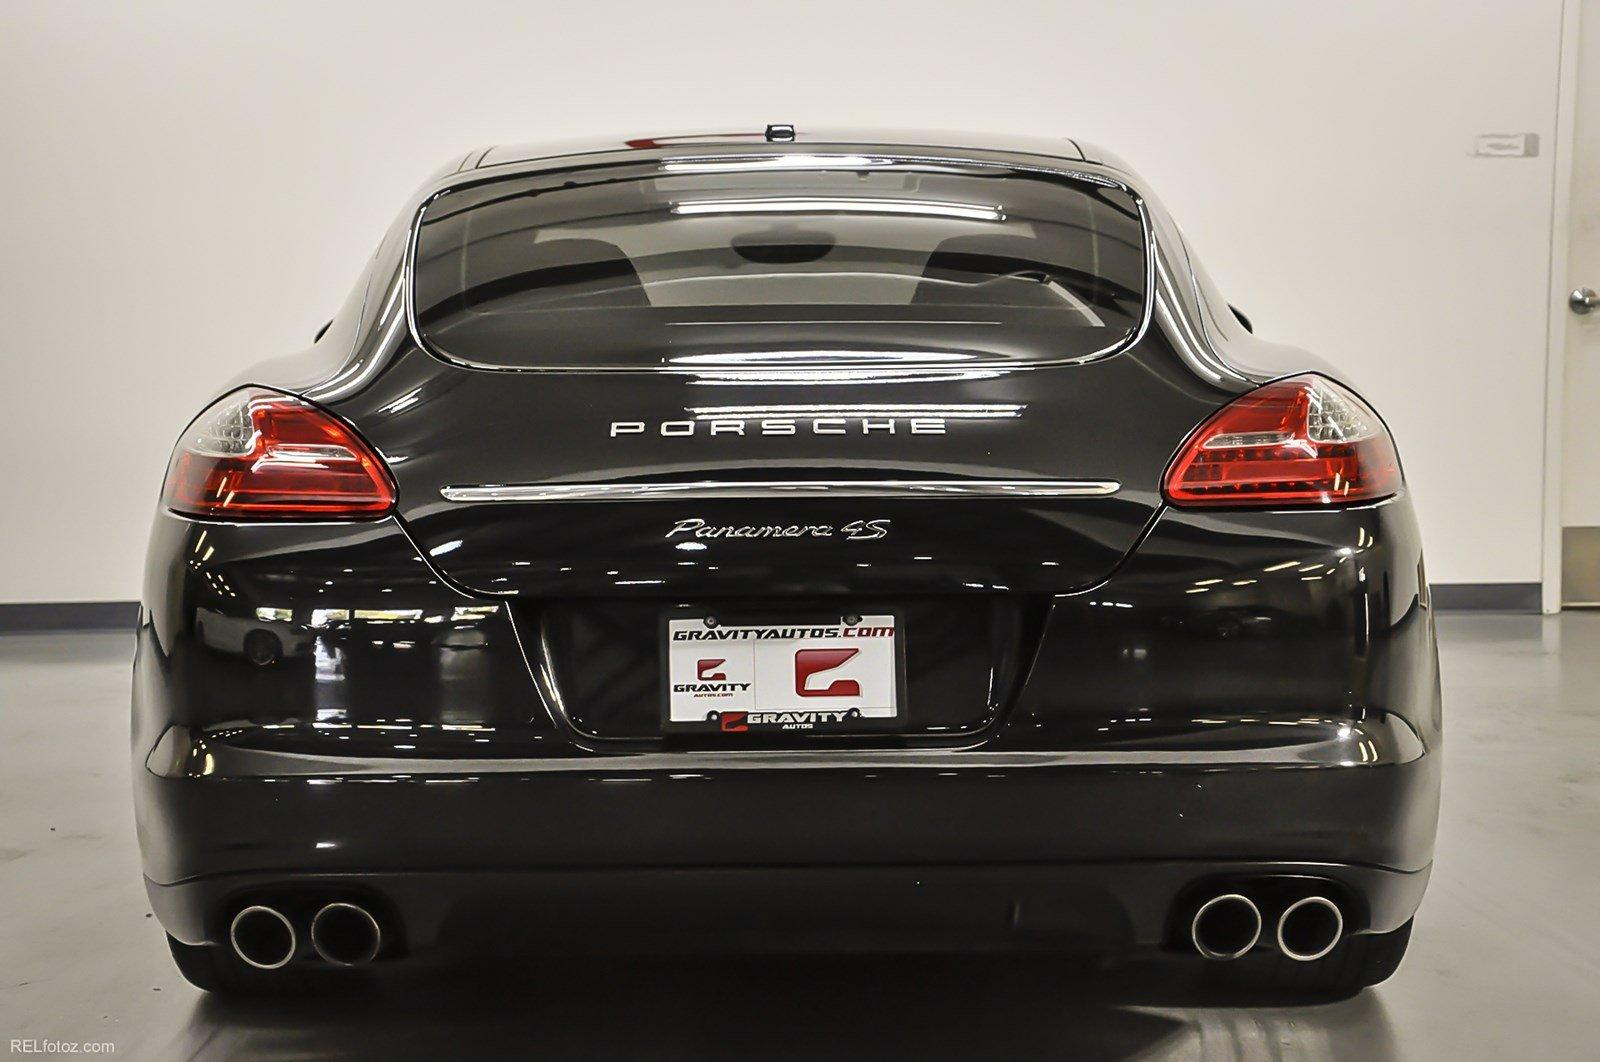 2010 Porsche Panamera 4s Stock 060181 For Sale Near Marietta Ga Ga Porsche Dealer